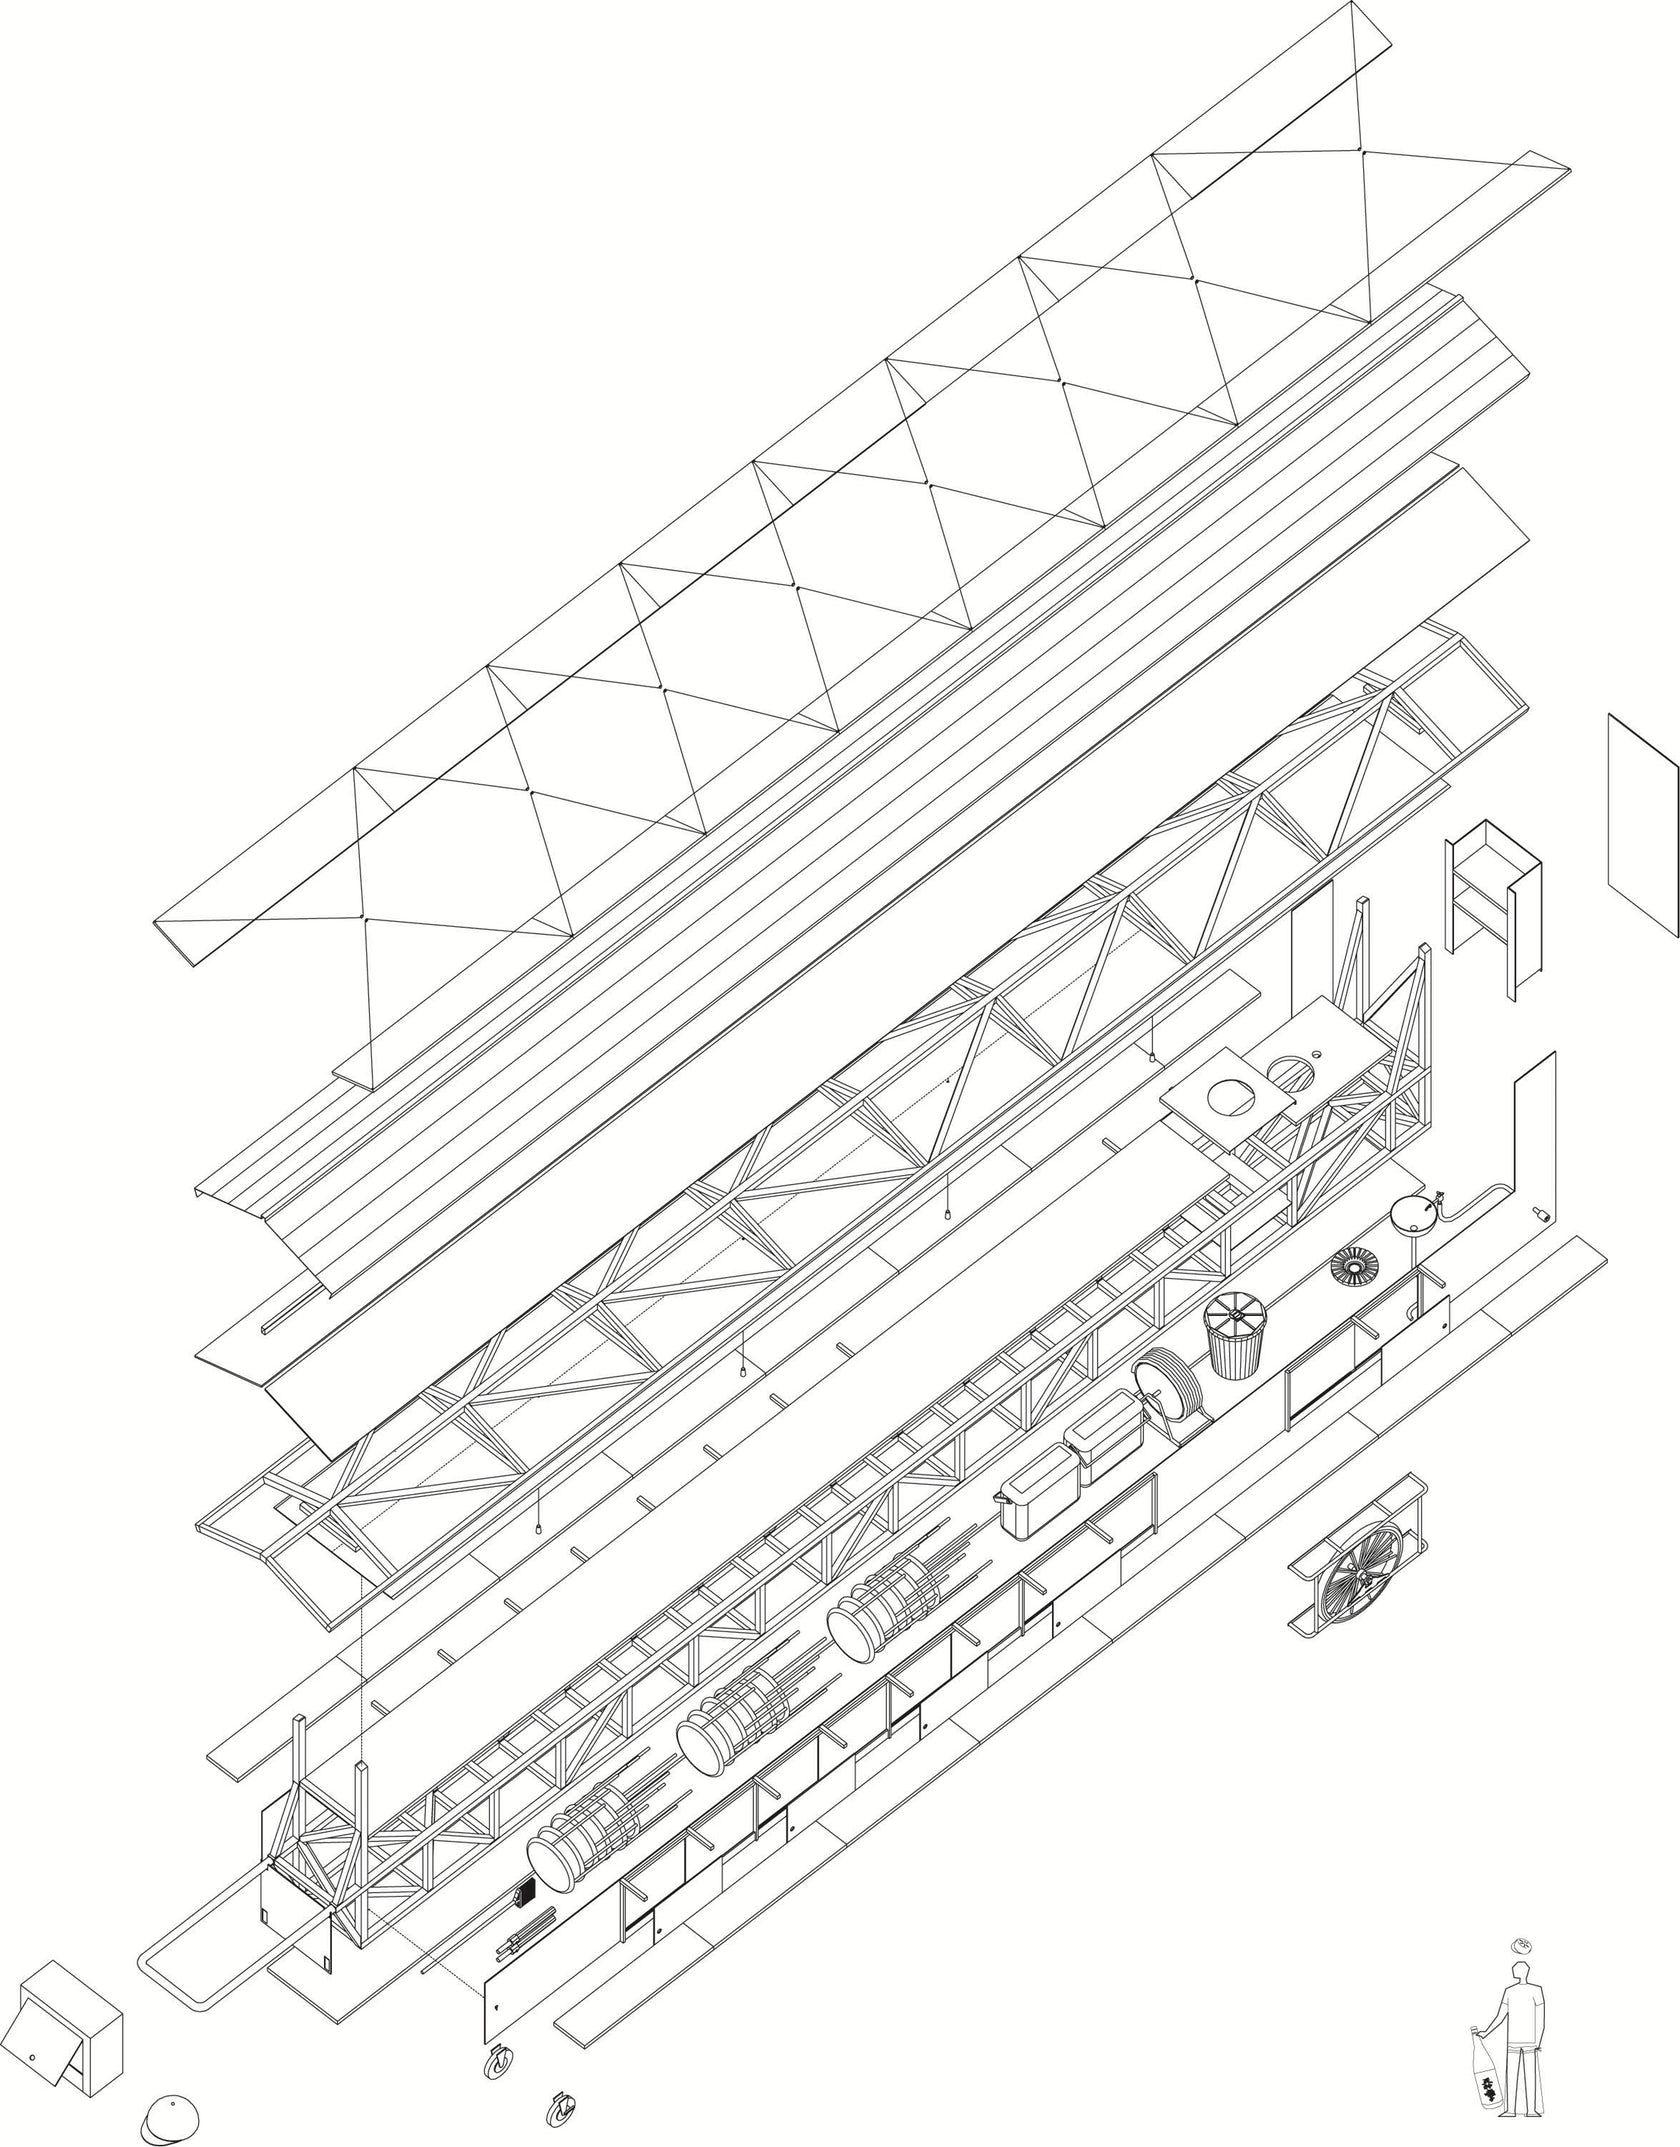 medium resolution of resultado de imagen para atelier bow wow white limousine yatai